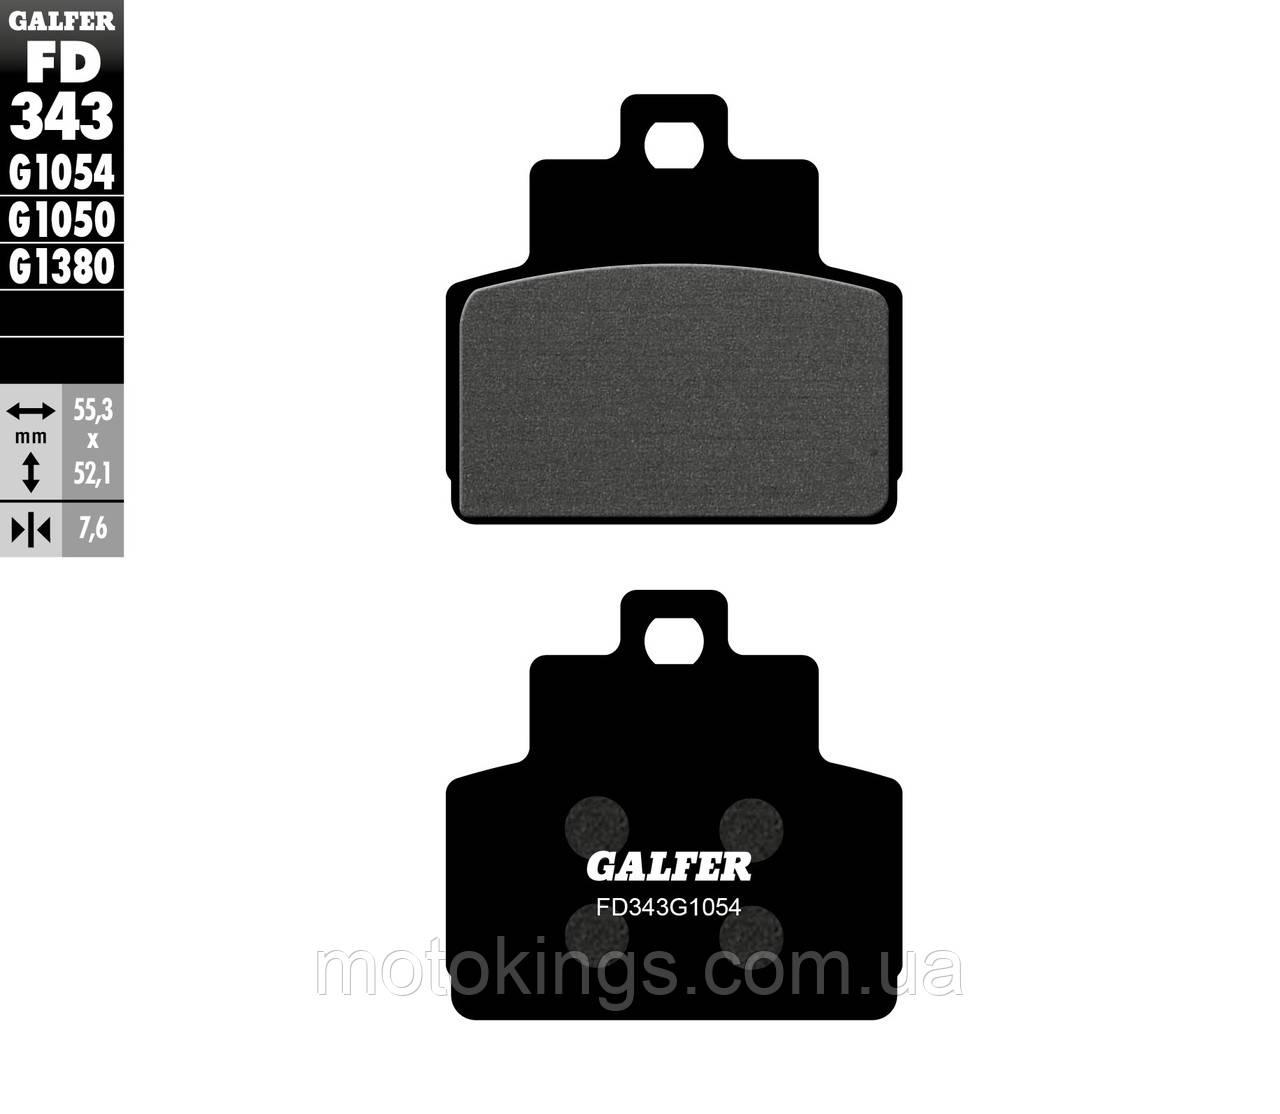 GALFER ТОРМОЗНЫЕ КОЛОДКИ    KH425 SKUTЕR PIAGGIO (ЗАДНИЕ) (FD343G1054)